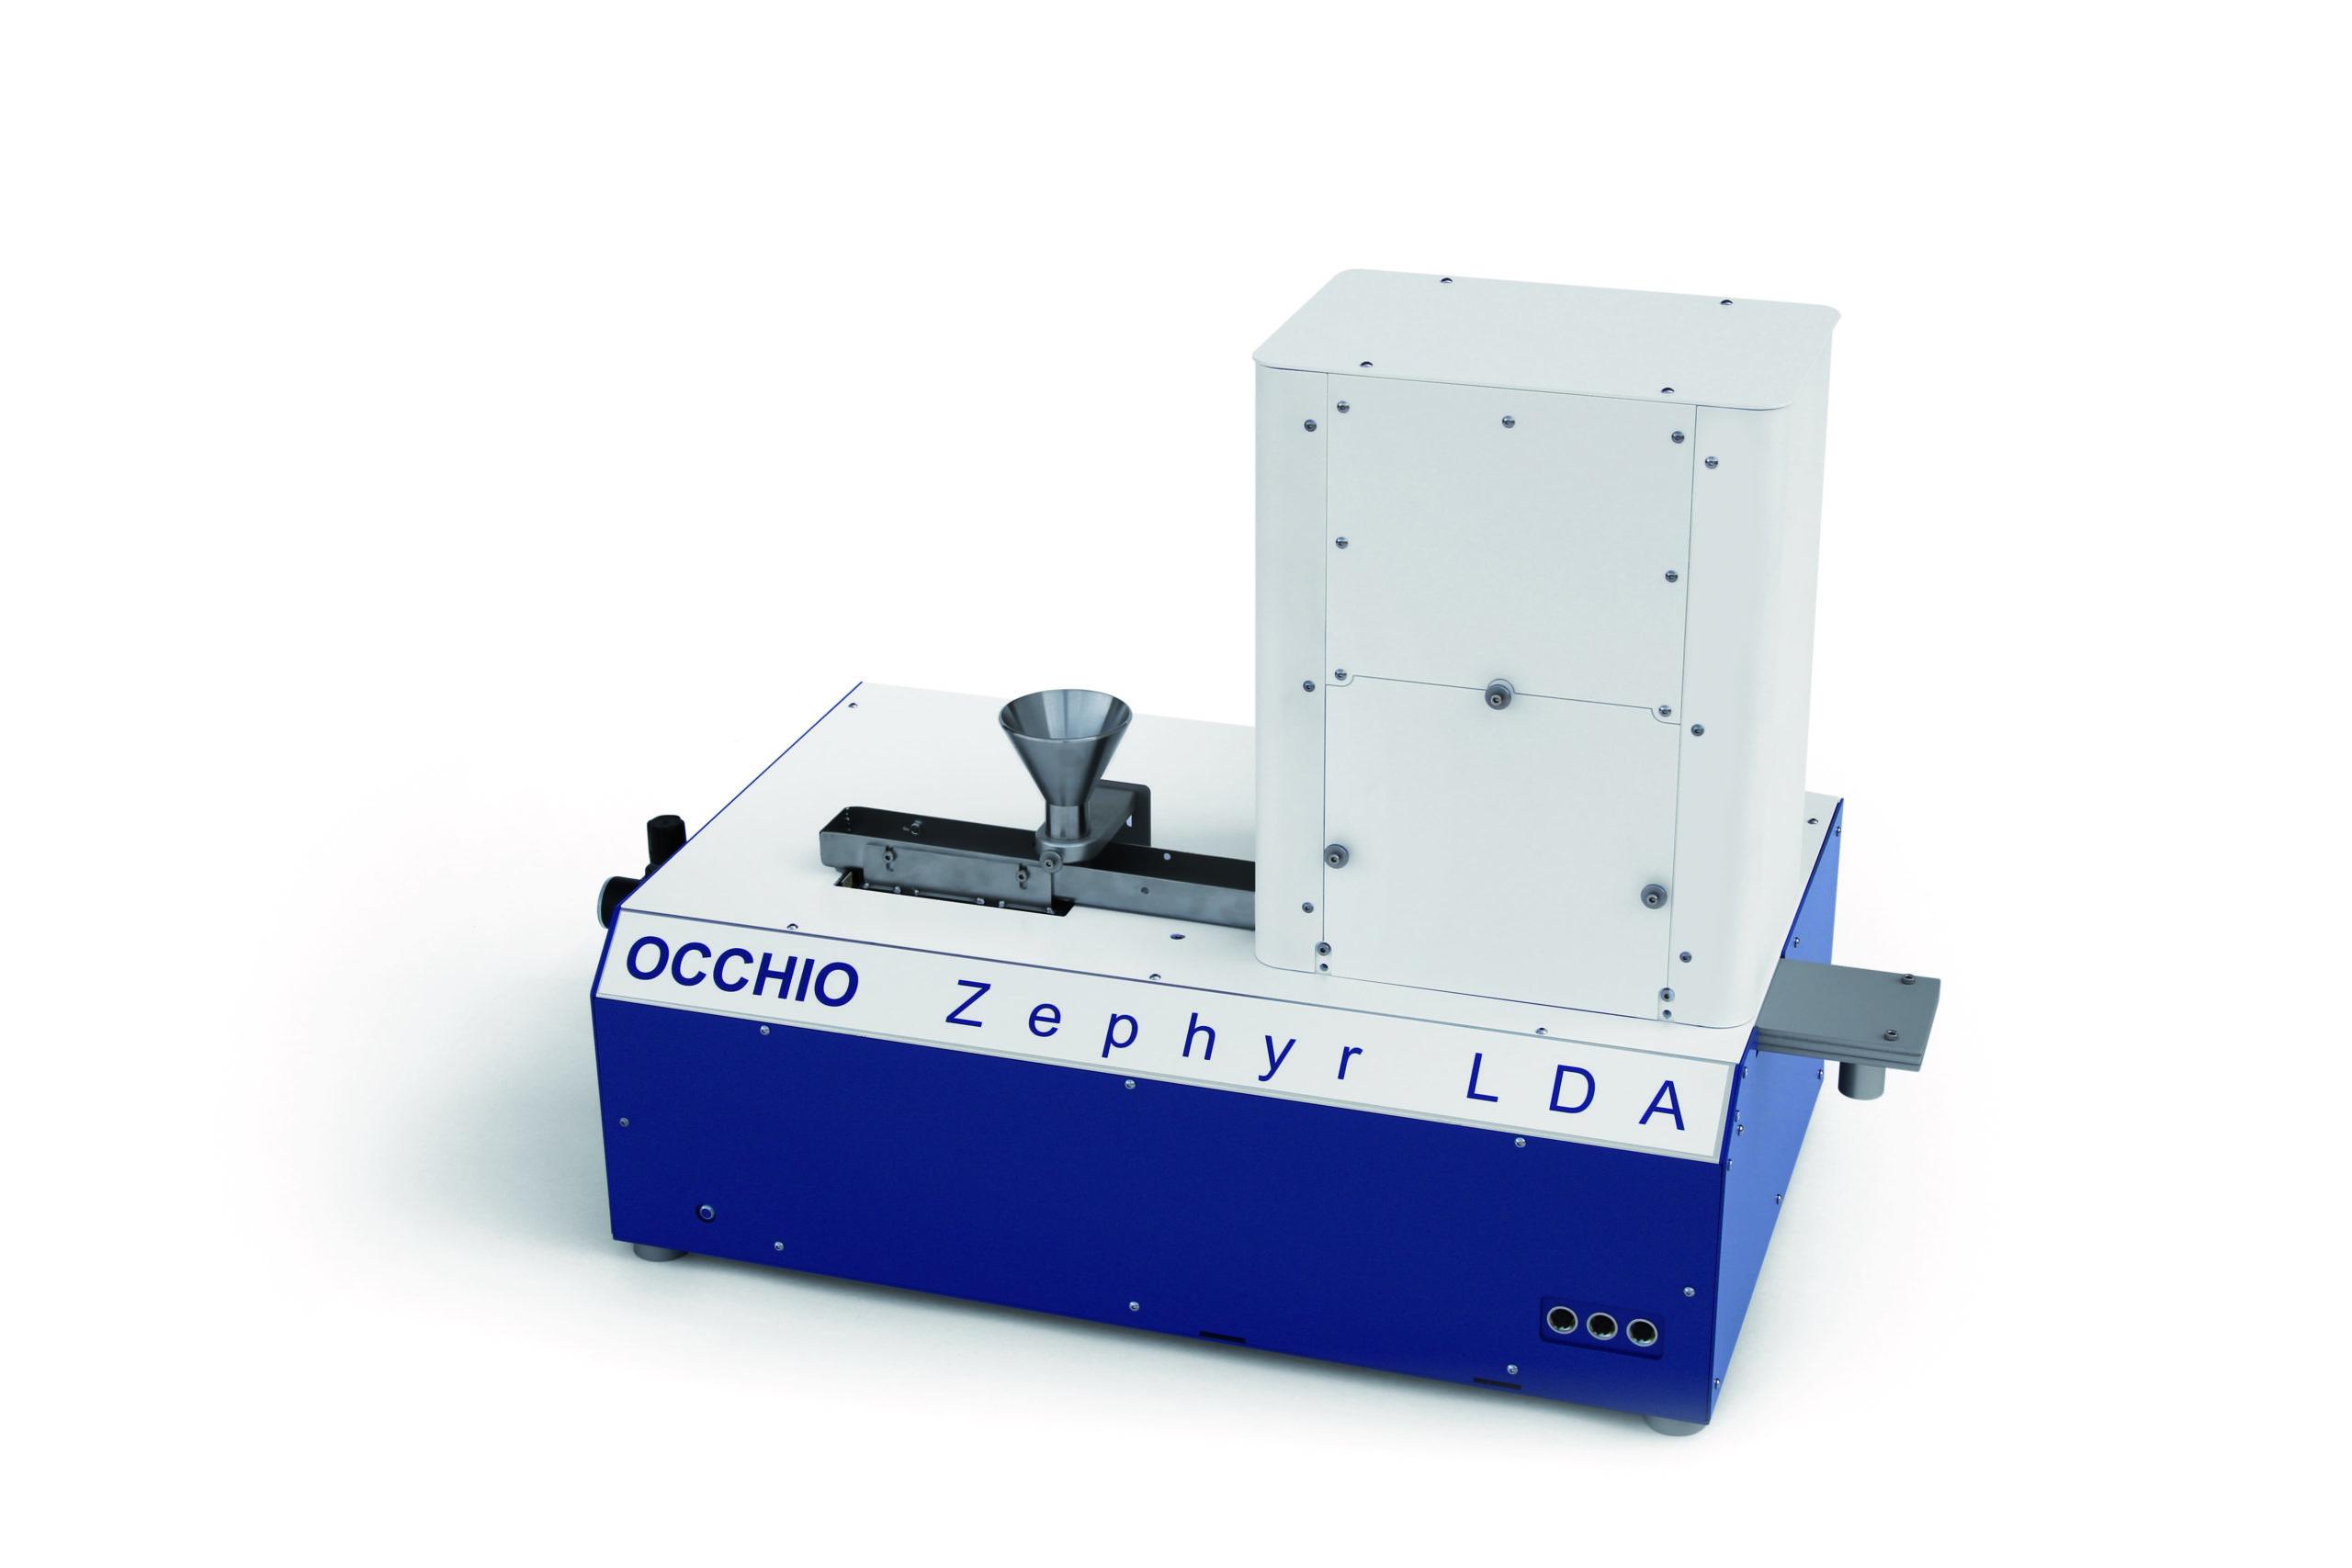 Zephyr LDA